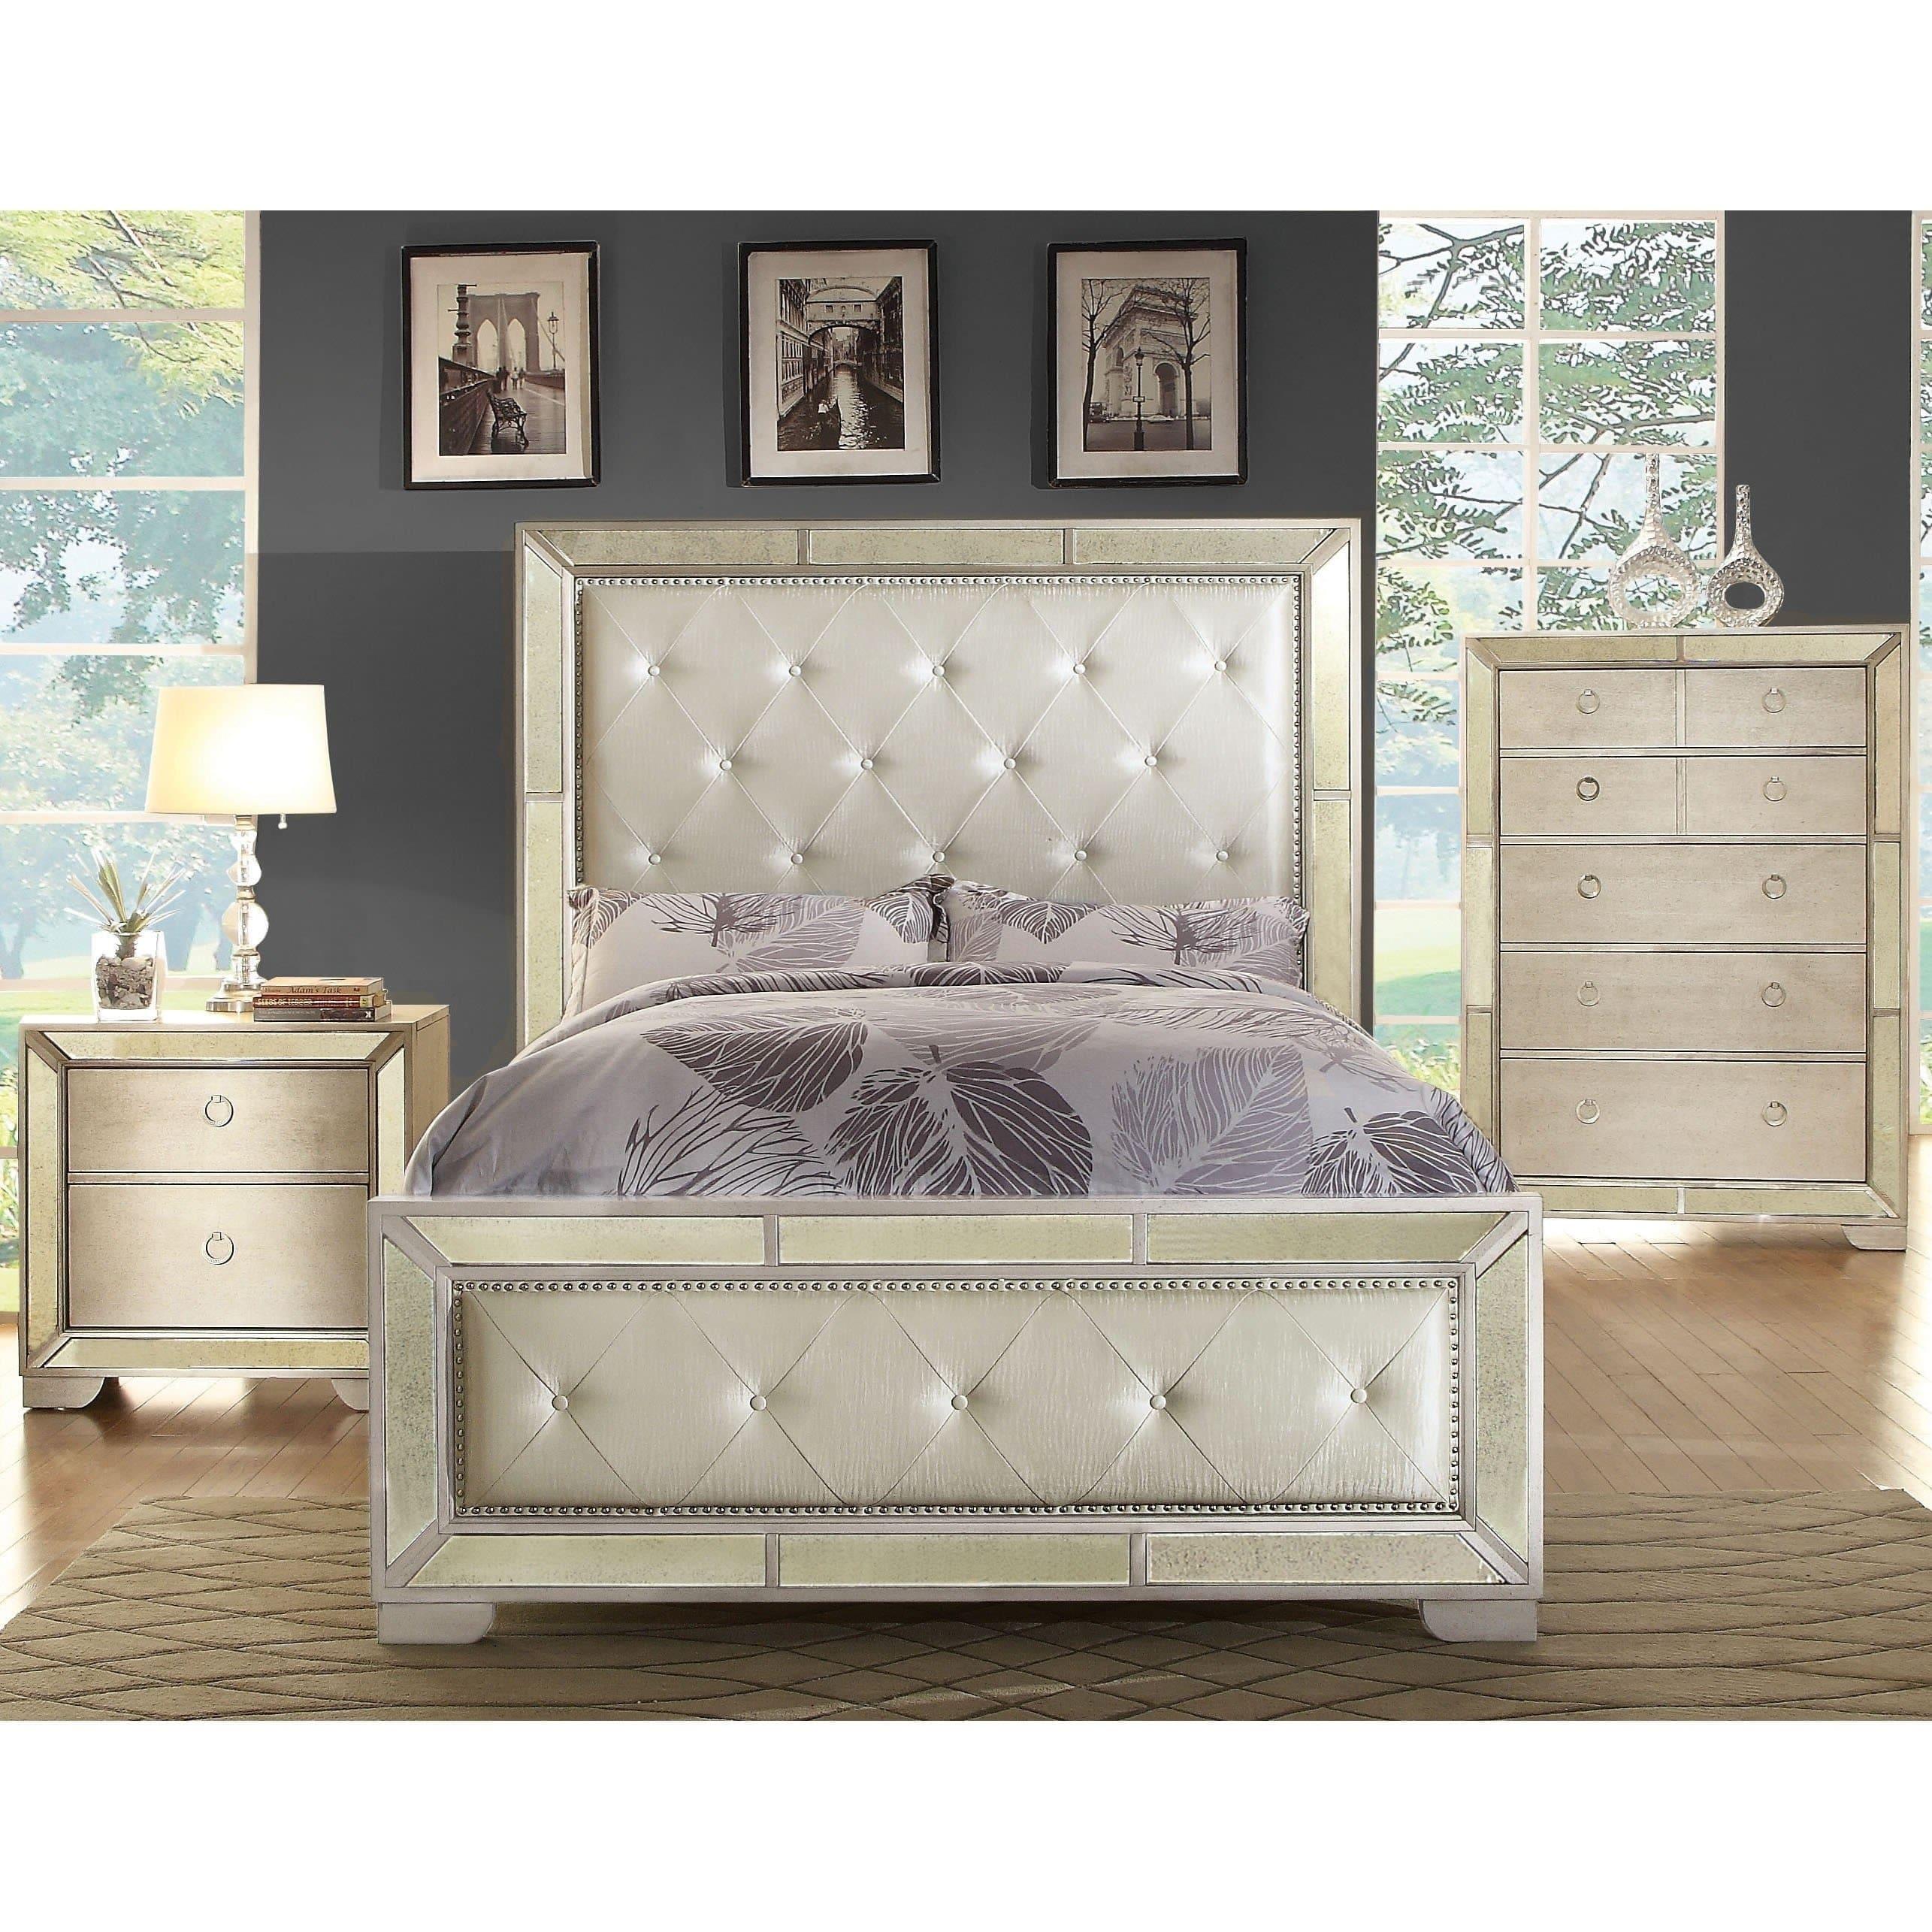 Furniture Of America Gevi Modern Mirrored 3 Piece Bedroom Set On Sale Overstock 10566132 Eastern King